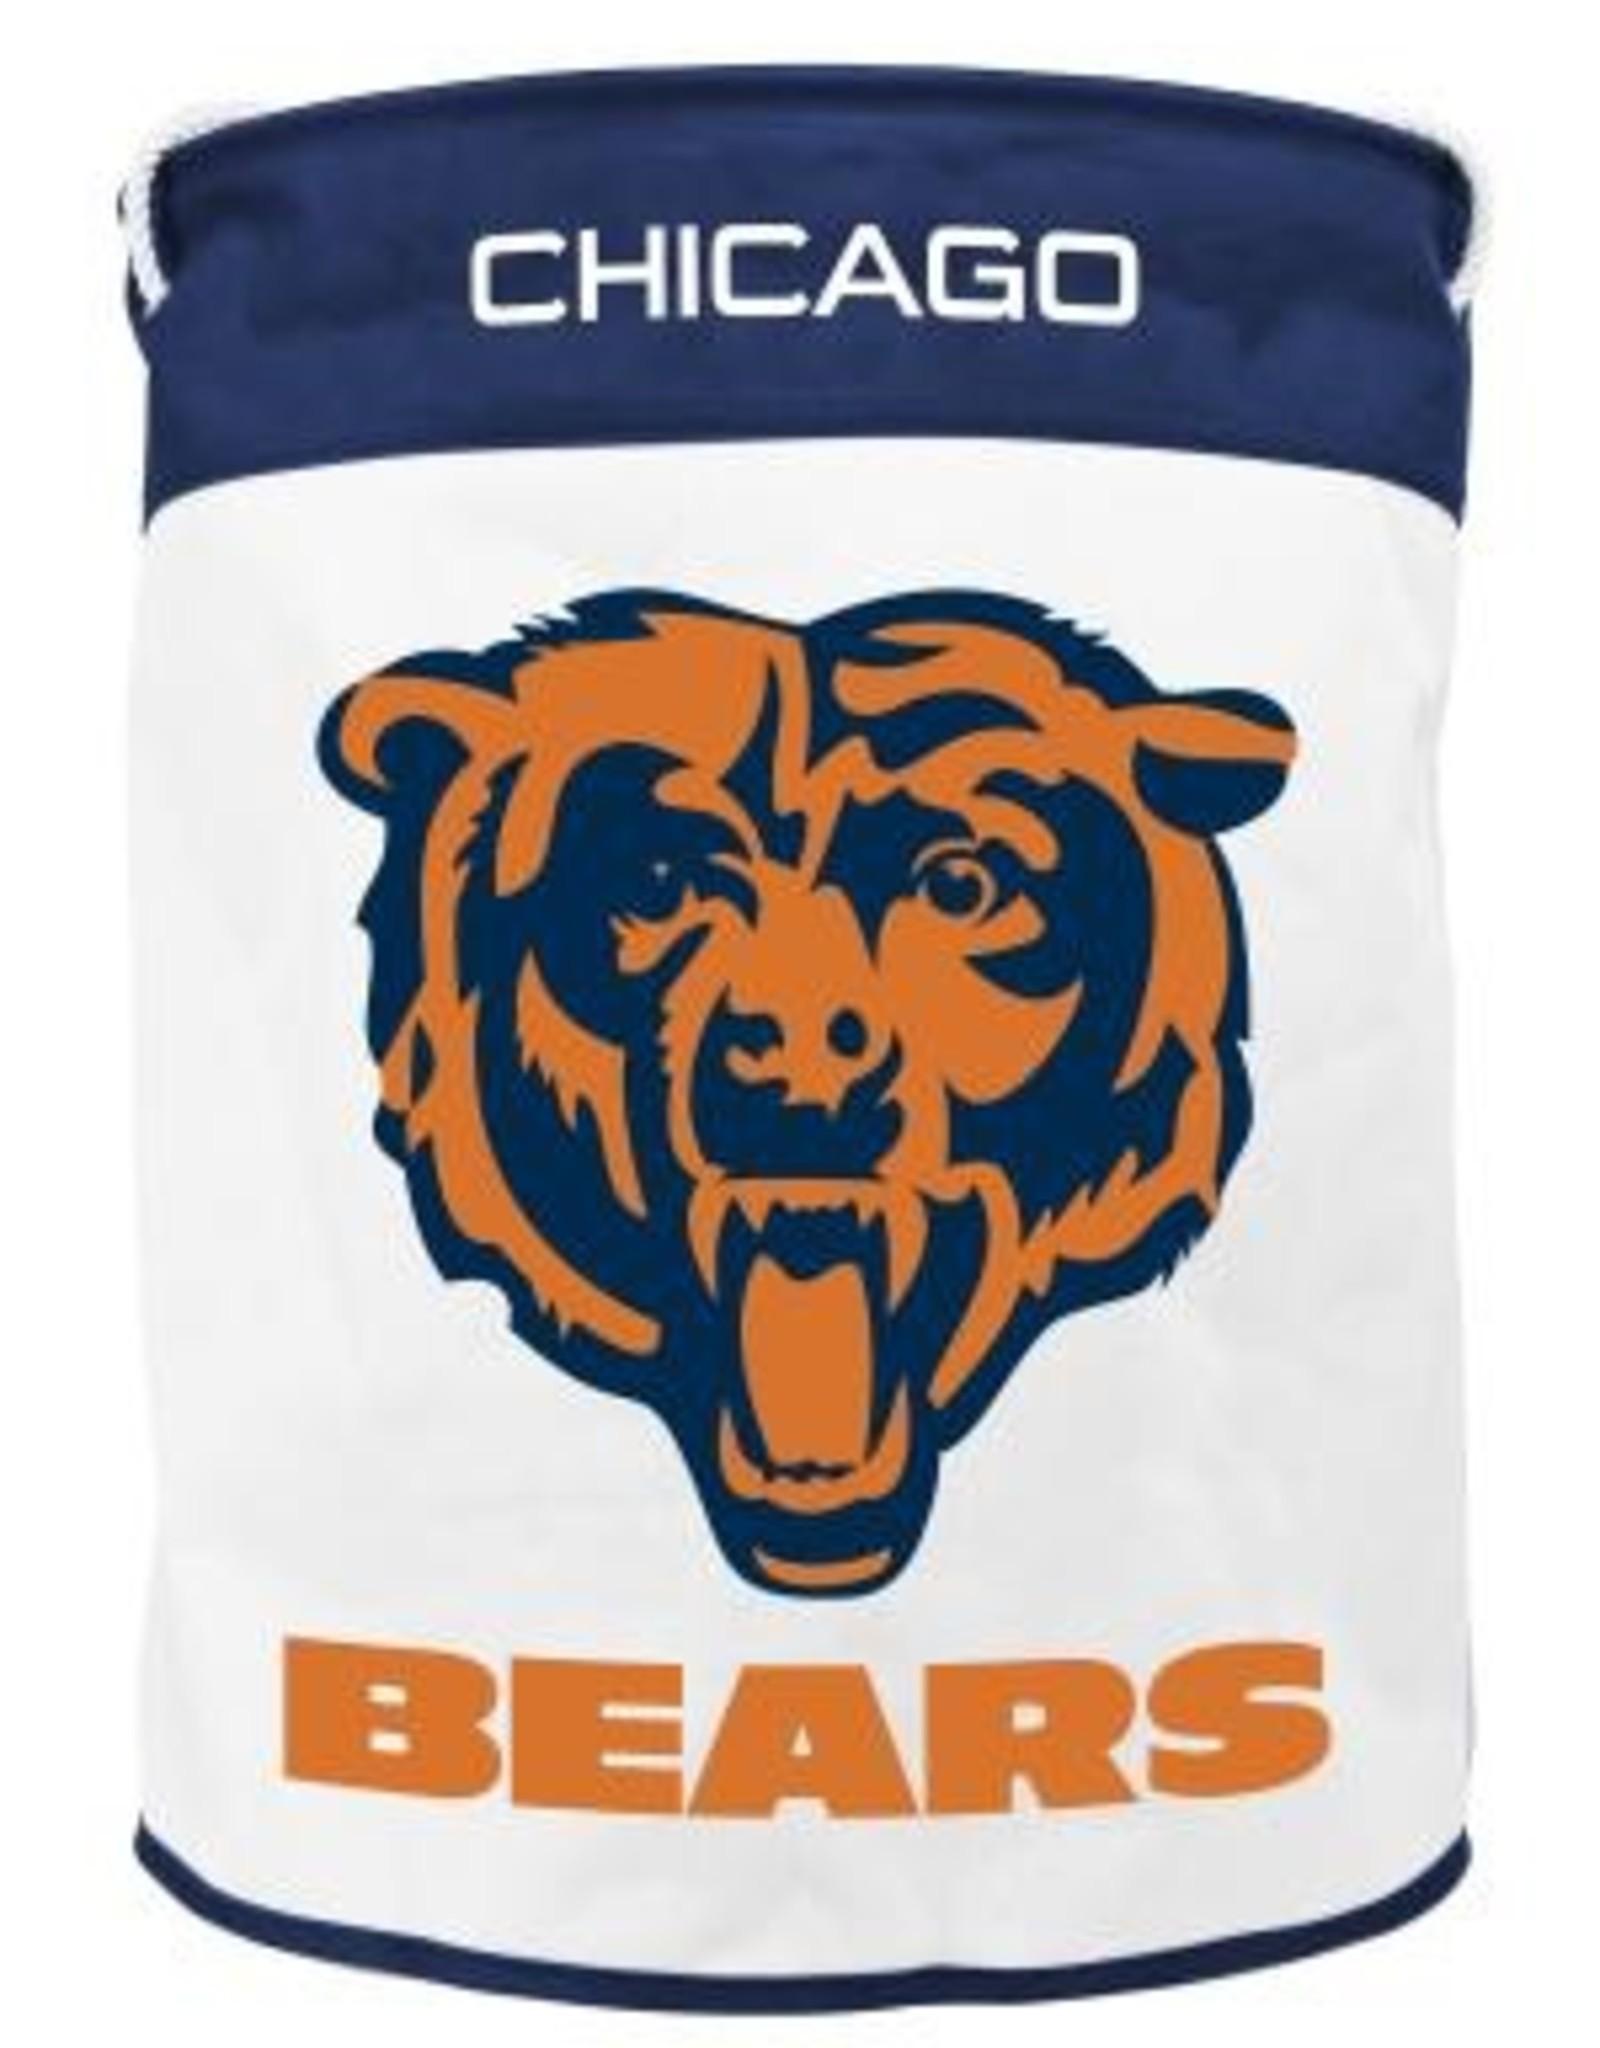 Chicago Bears Canvas Laundry Basket